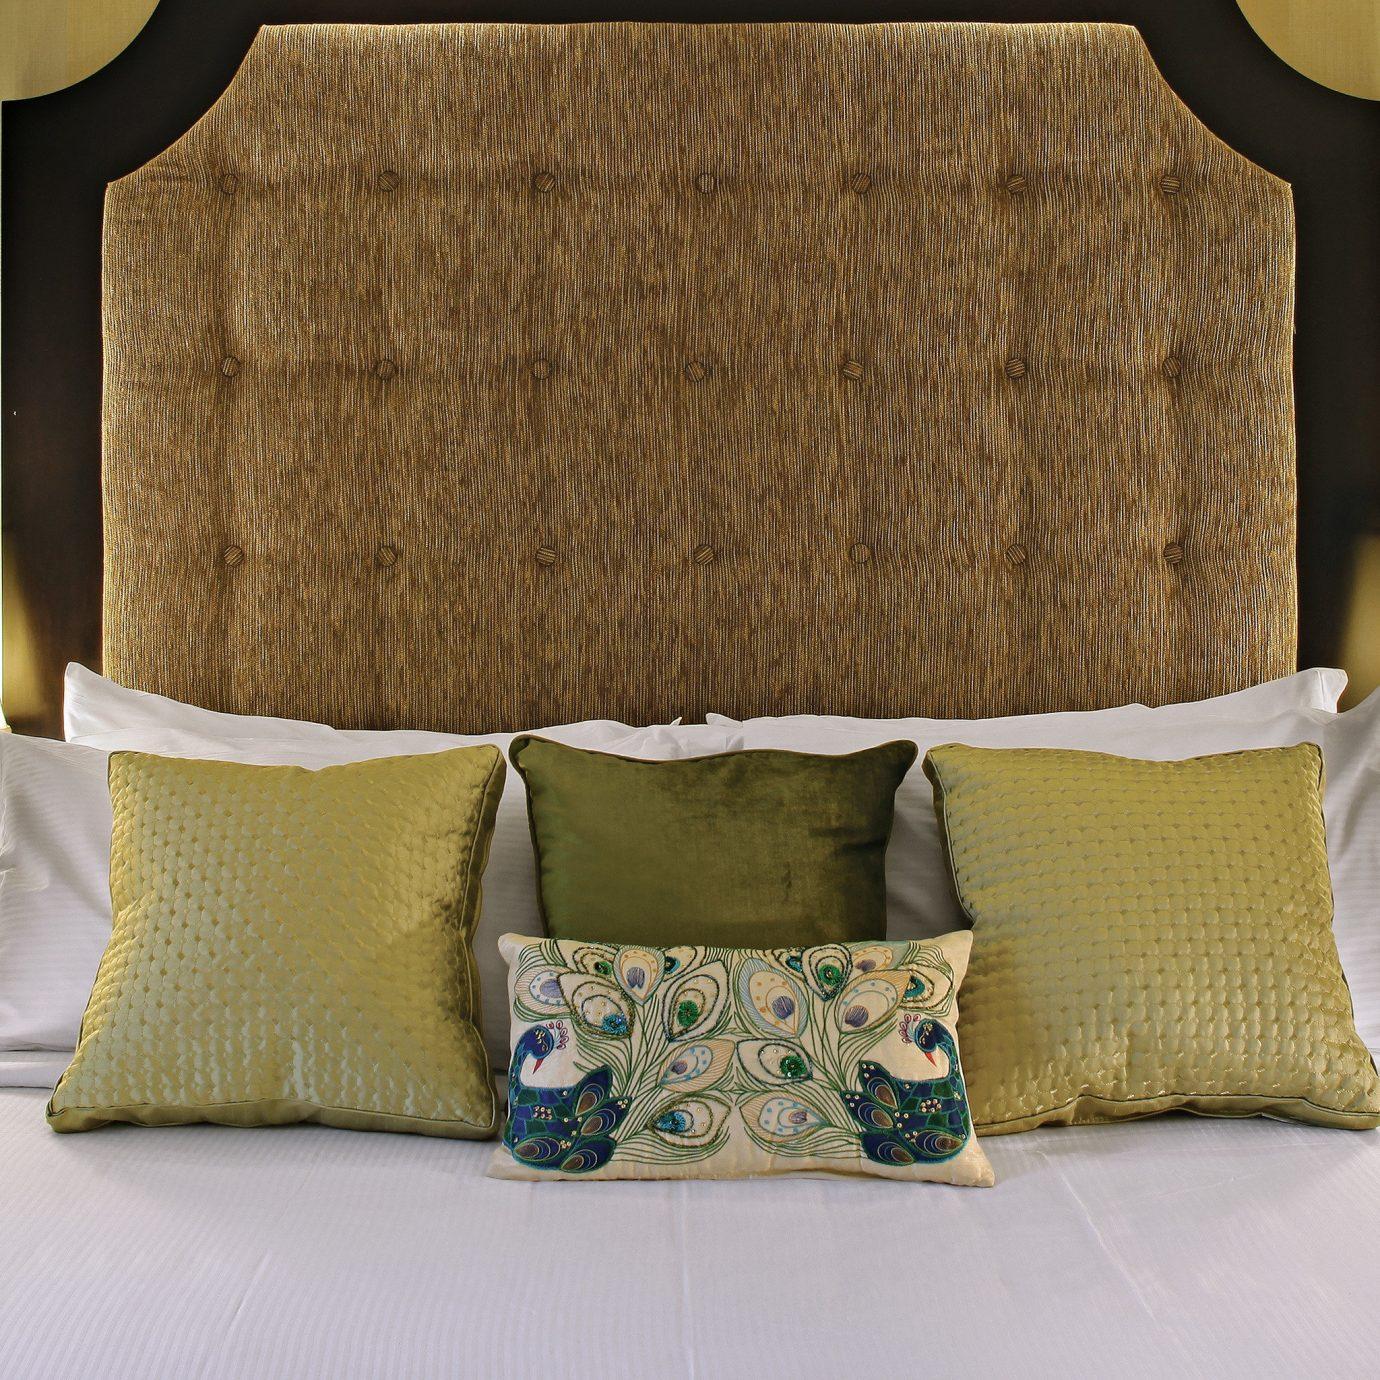 Bedroom Elegant Inn Luxury pillow Suite bed sheet cottage textile lamp